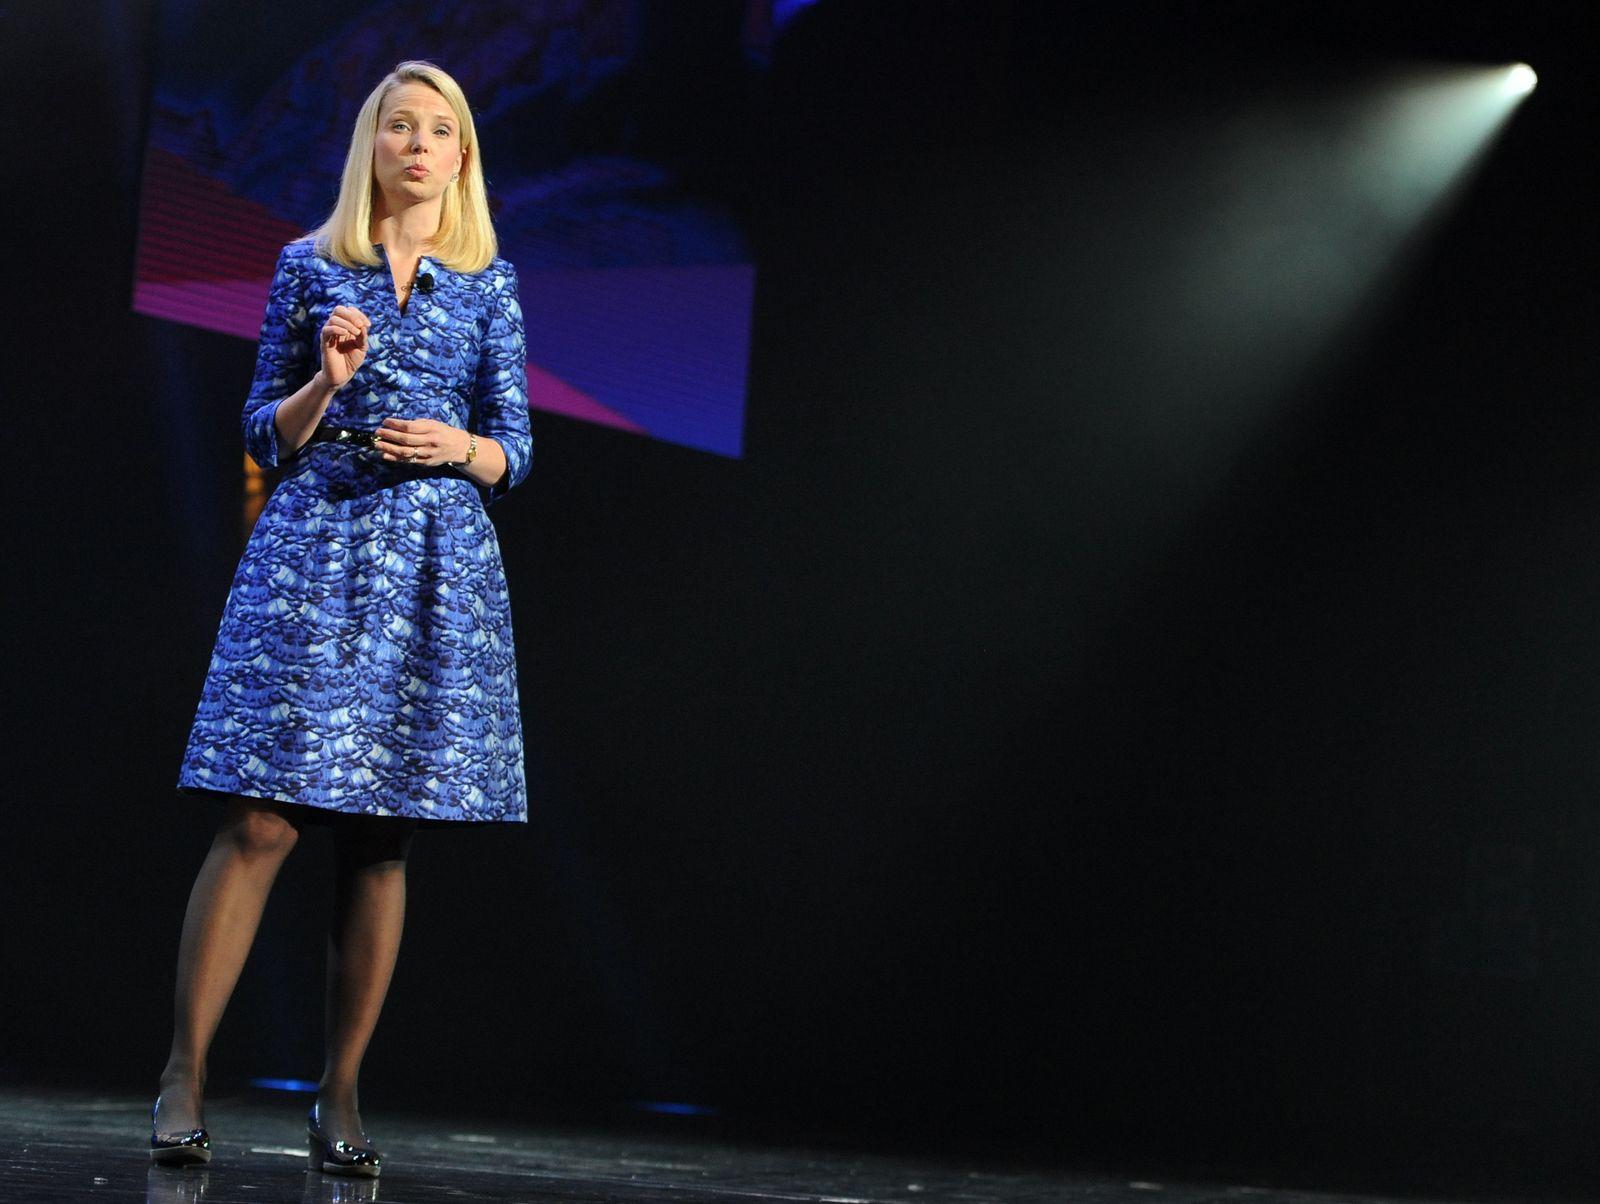 Yahoo-Chefin Marissa Mayer CES 2014